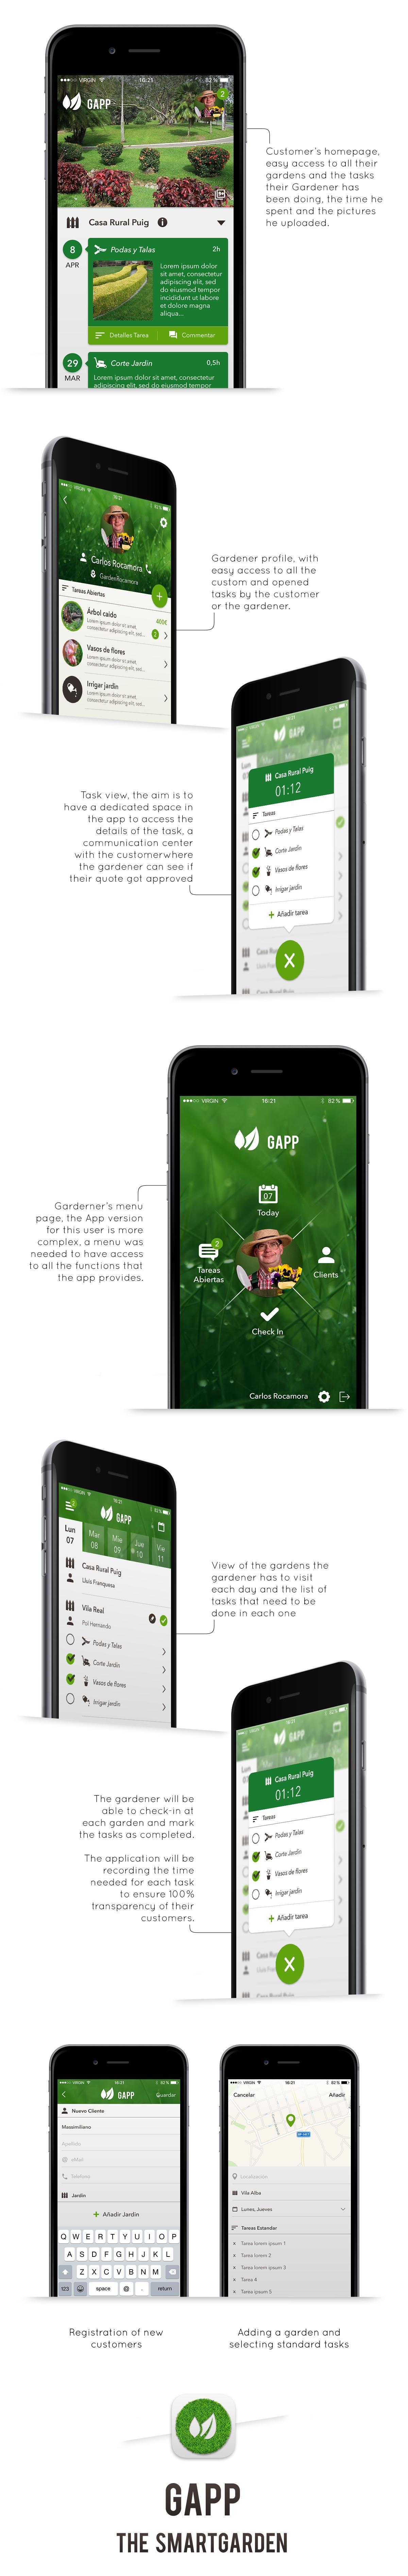 App-presentation